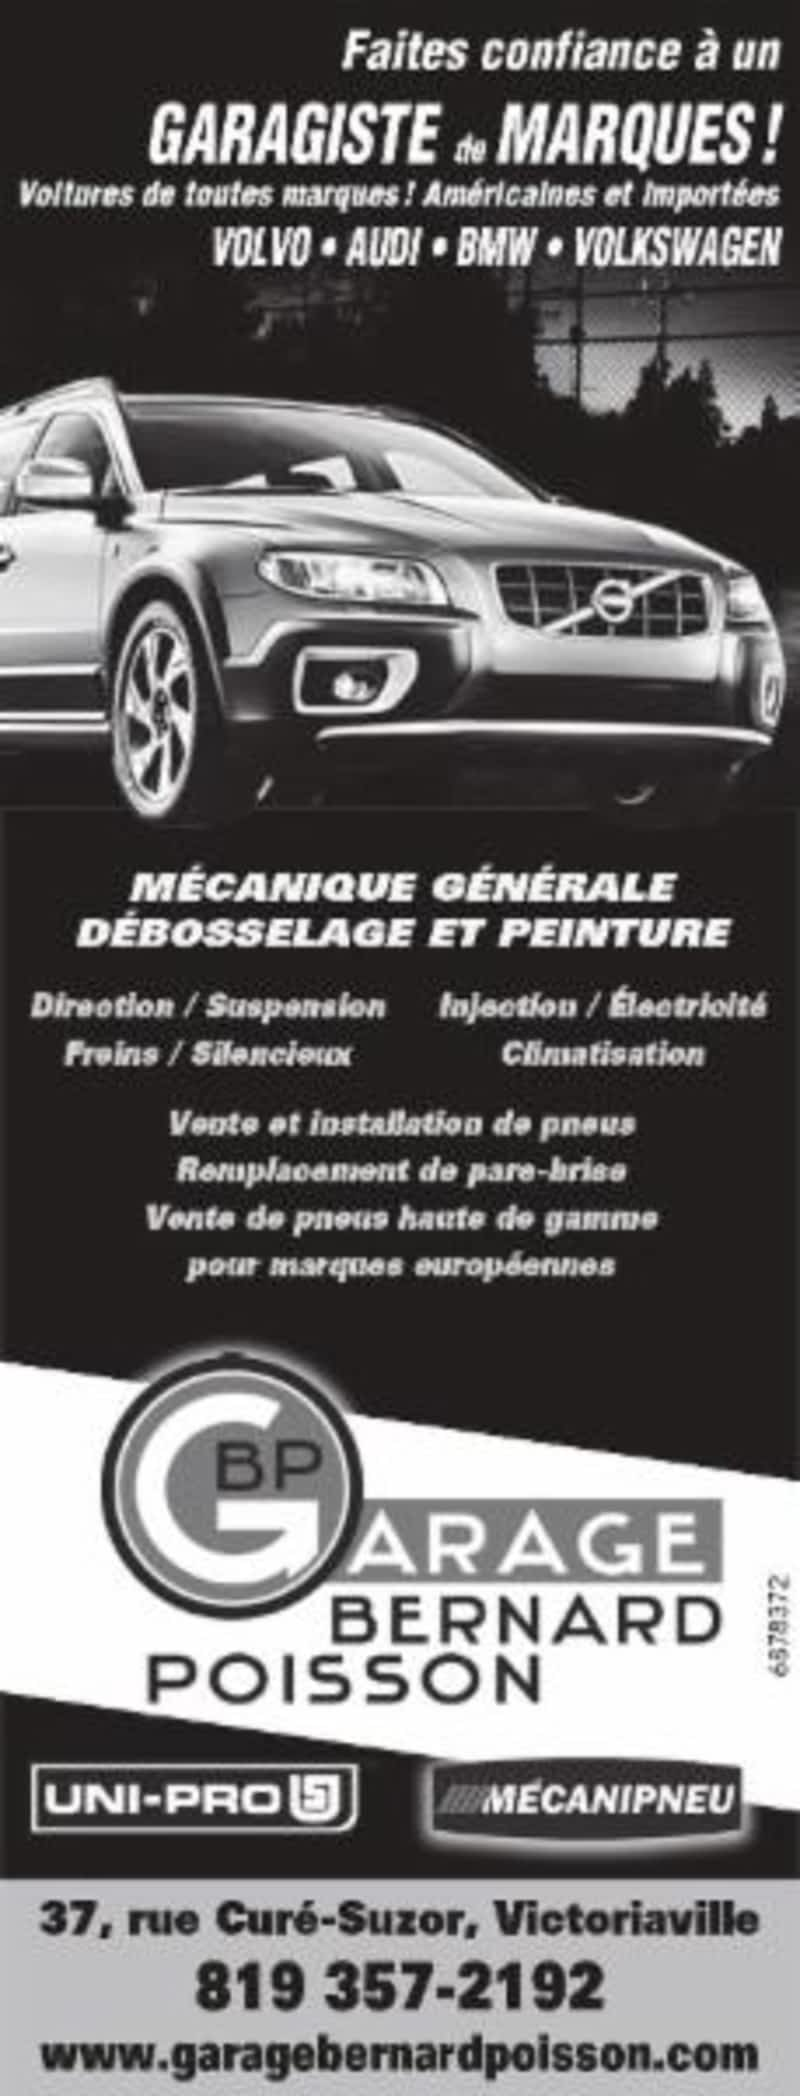 Garage bernard poisson victoriaville qc 37 rue du for Cash piscine cuers